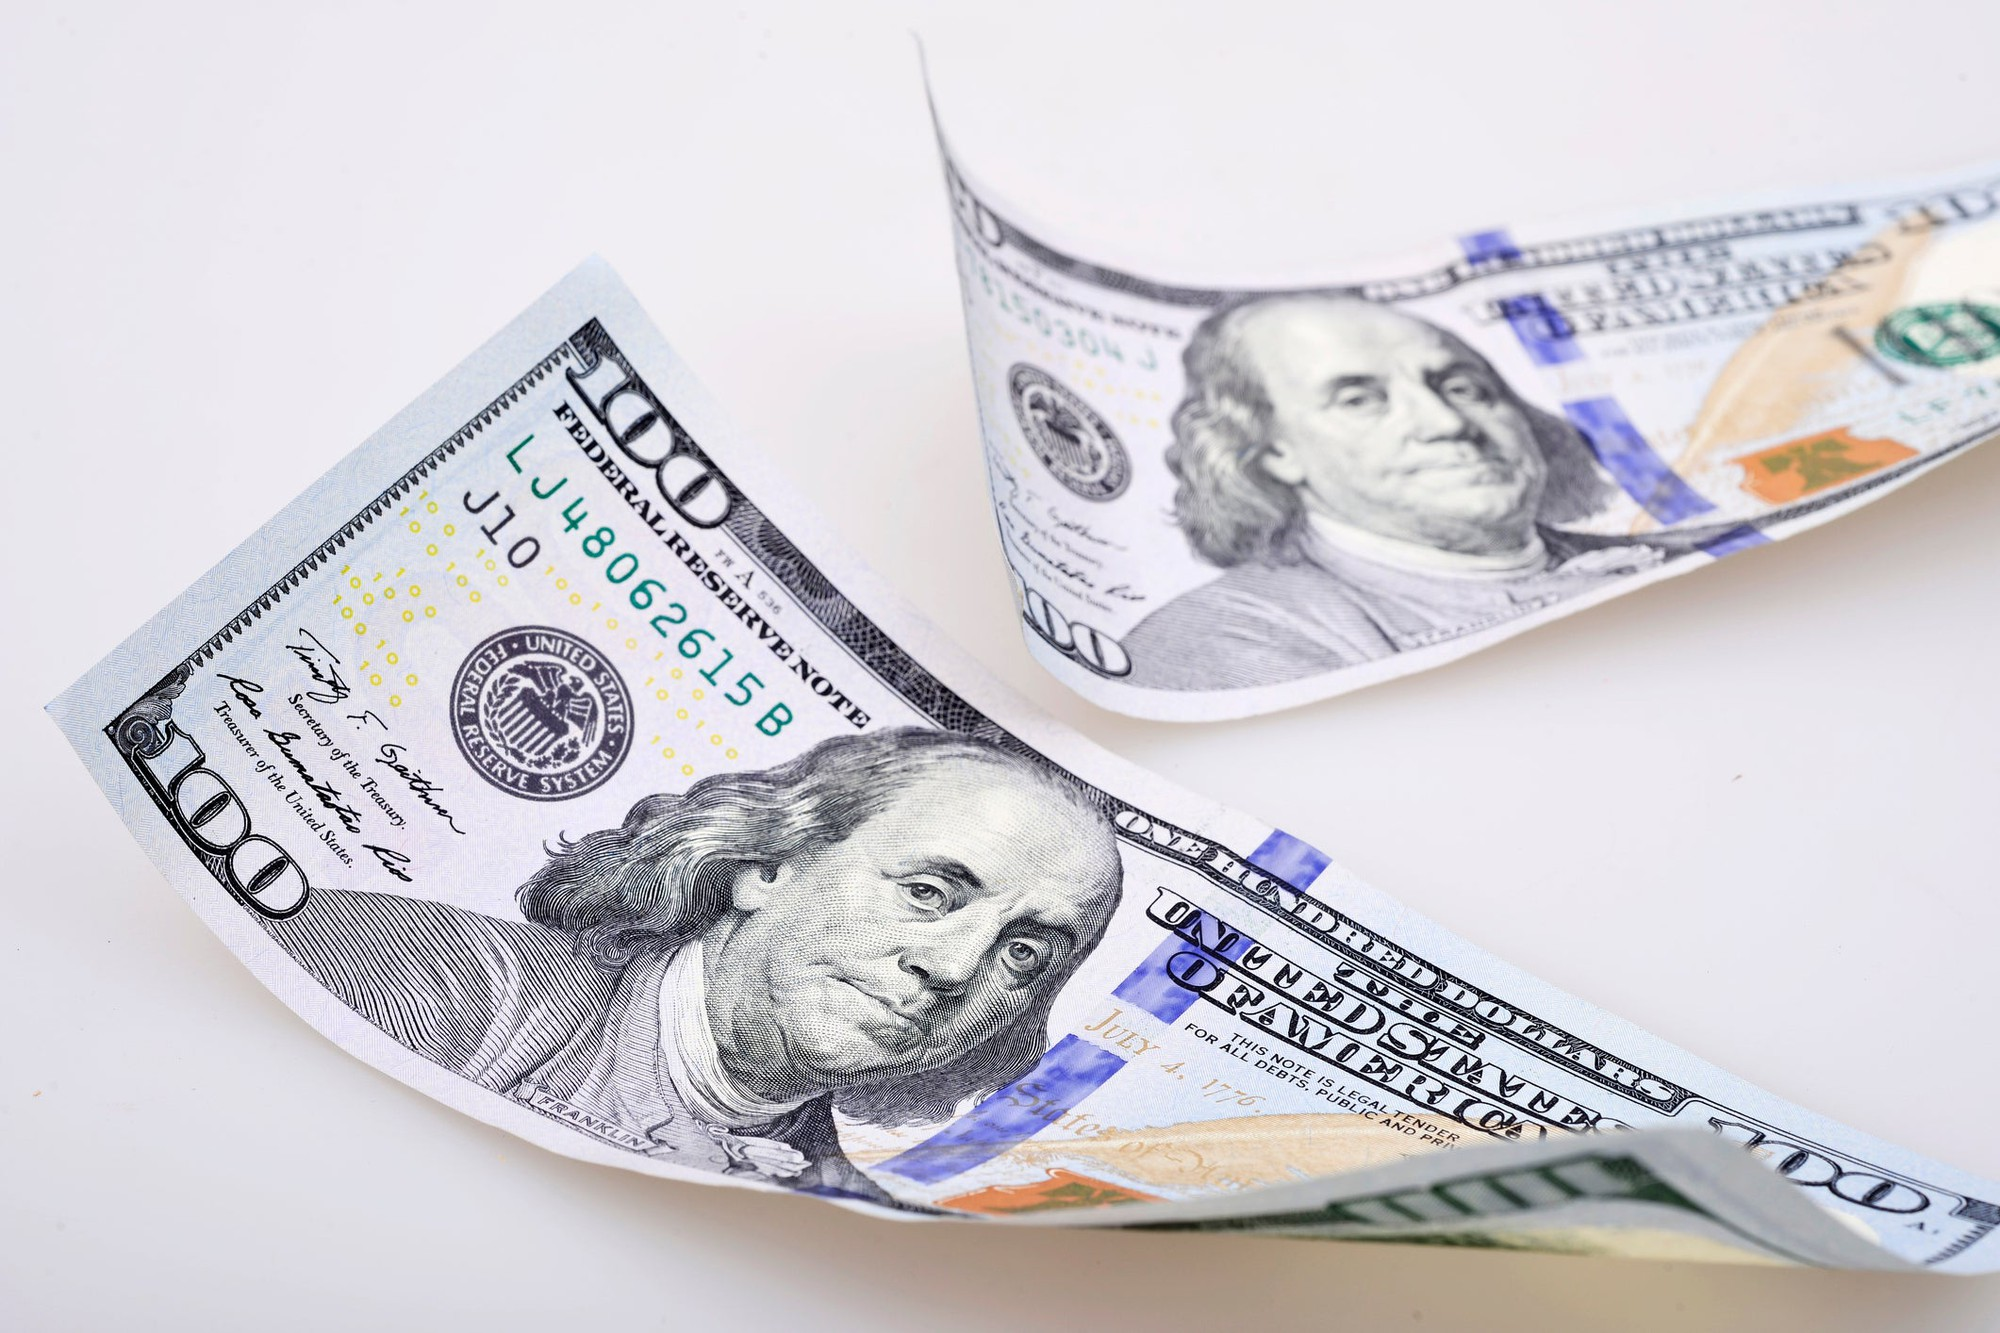 https://g.foolcdn.com/image/?url=https%3A//g.foolcdn.com/editorial/images/637486/two-hundred-dollars-cash-money-invest-retire-stocks-getty.jpg&w=2000&op=resize